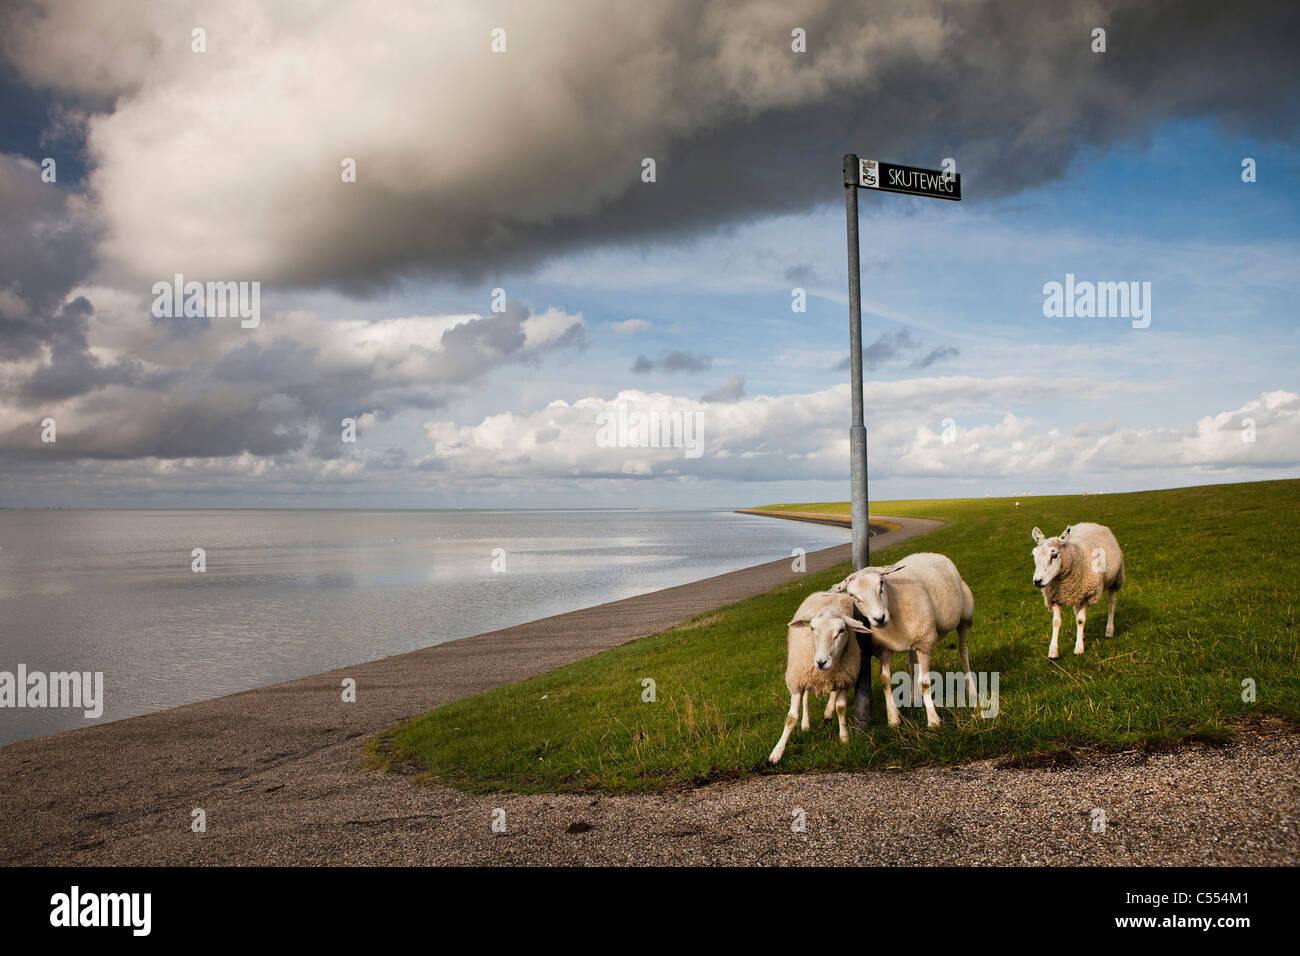 The Netherlands, Buren on Ameland Island, belonging to Wadden Sea Islands. Unesco World Heritage Site. Sheep on - Stock Image